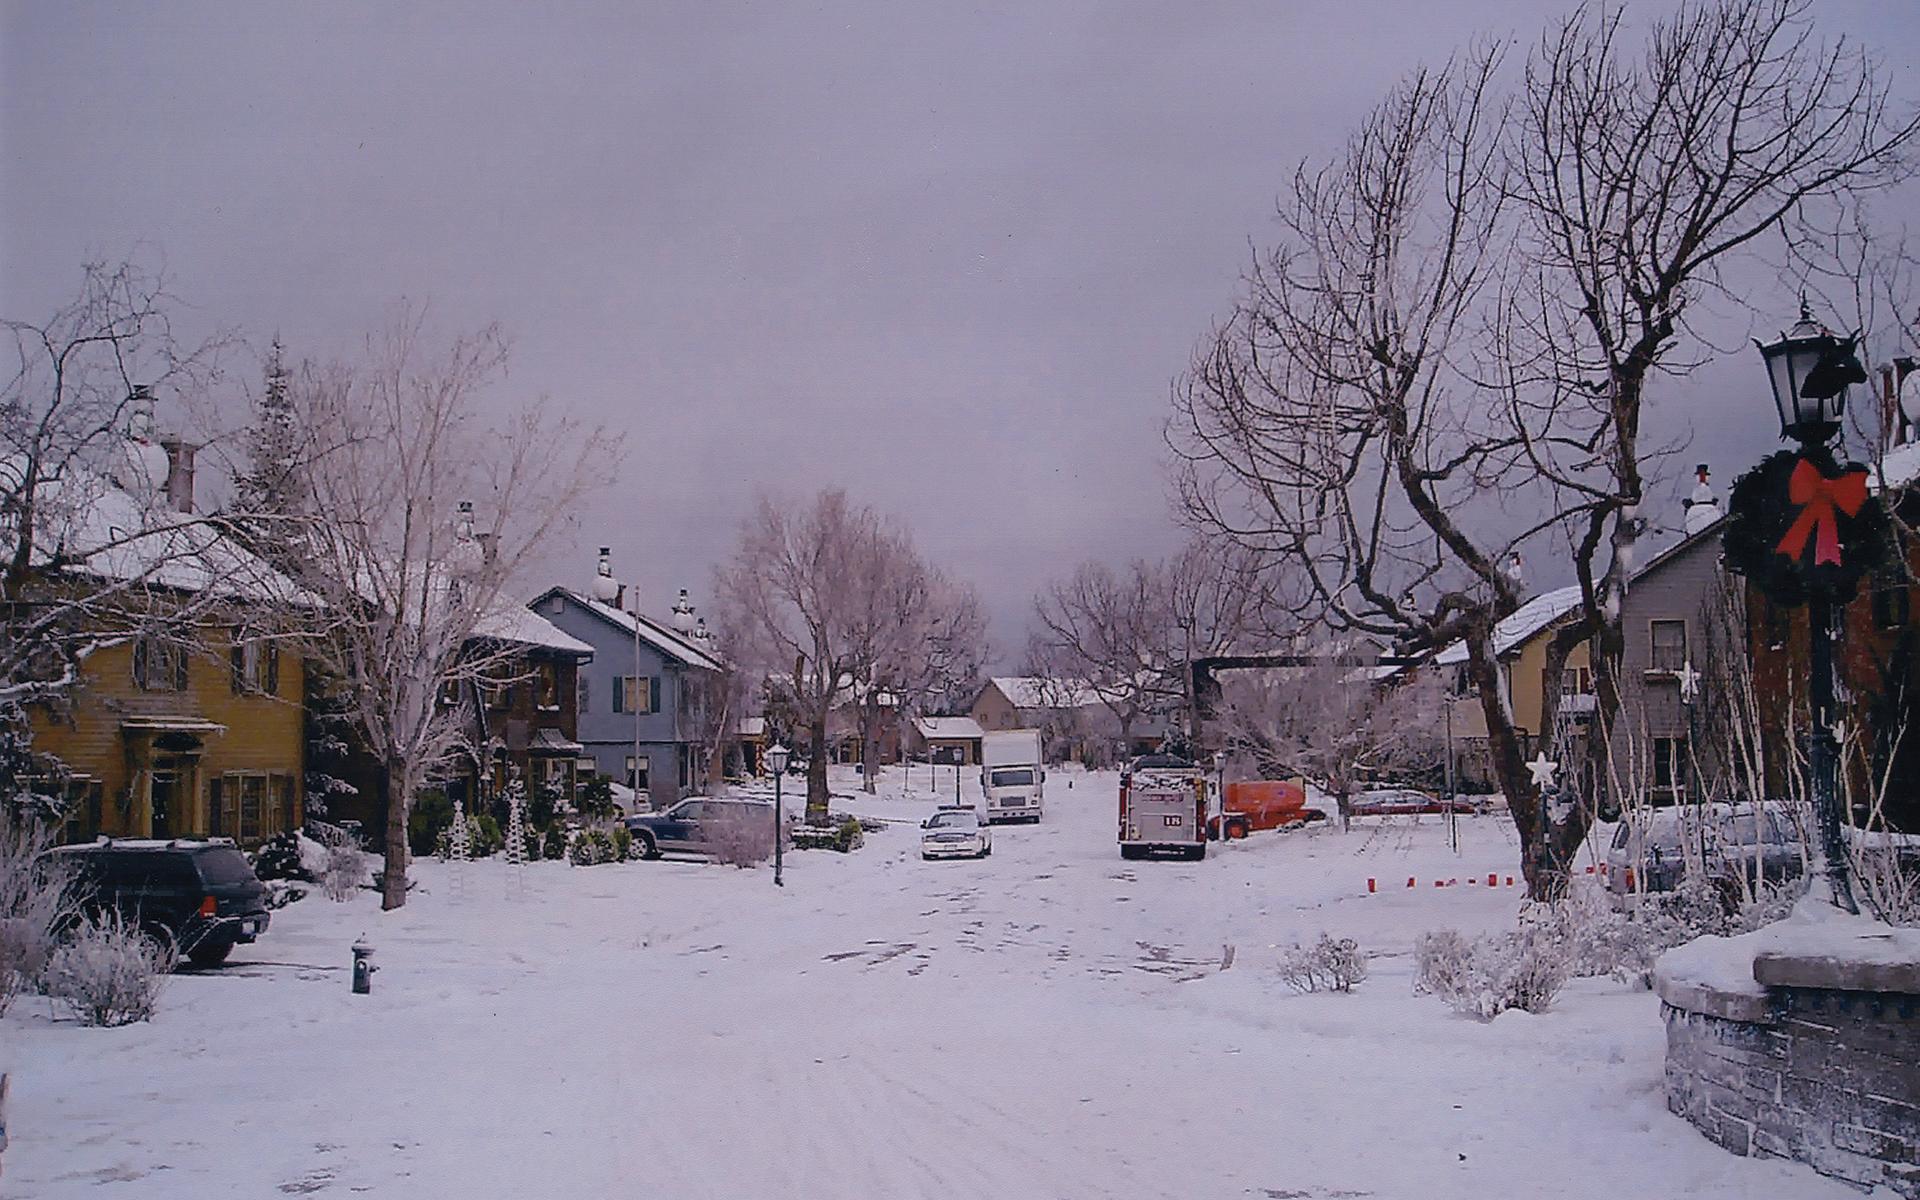 Christmas With The Kranks 2.Christmas With The Kranks 2004